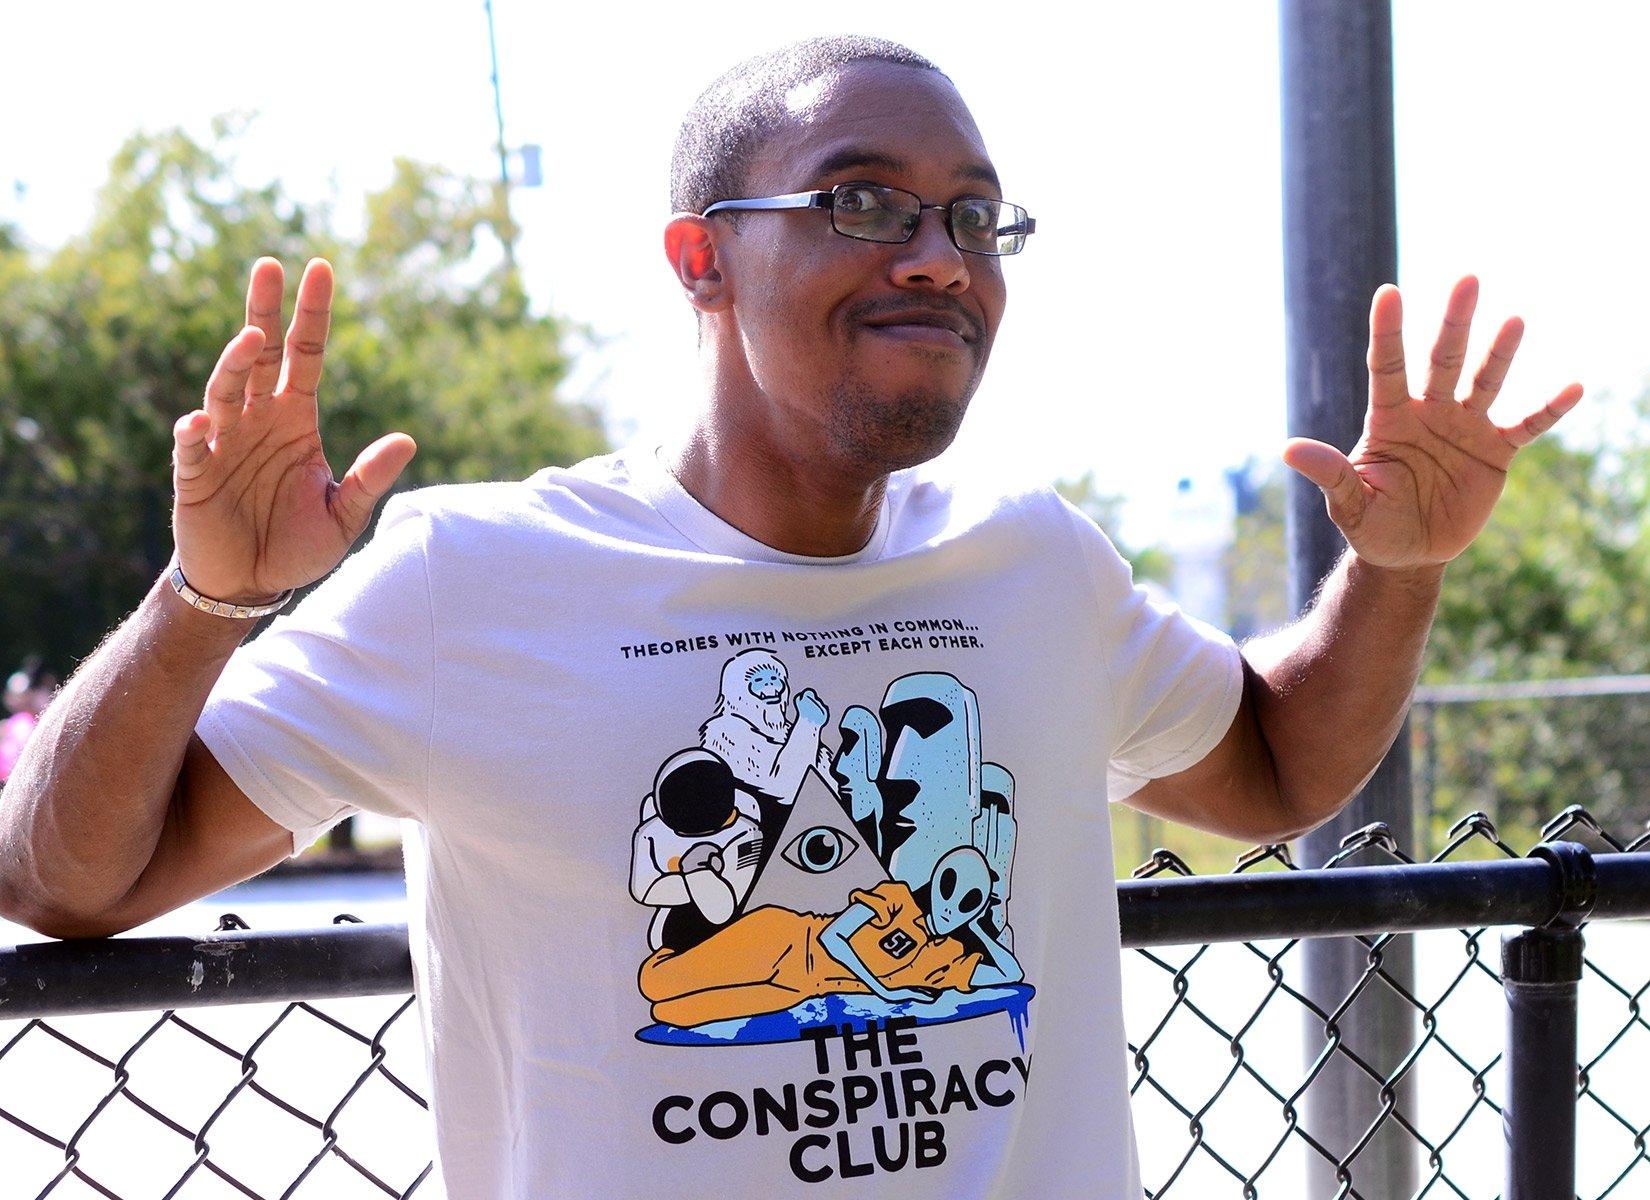 The Conspiracy Club on Mens T-Shirt